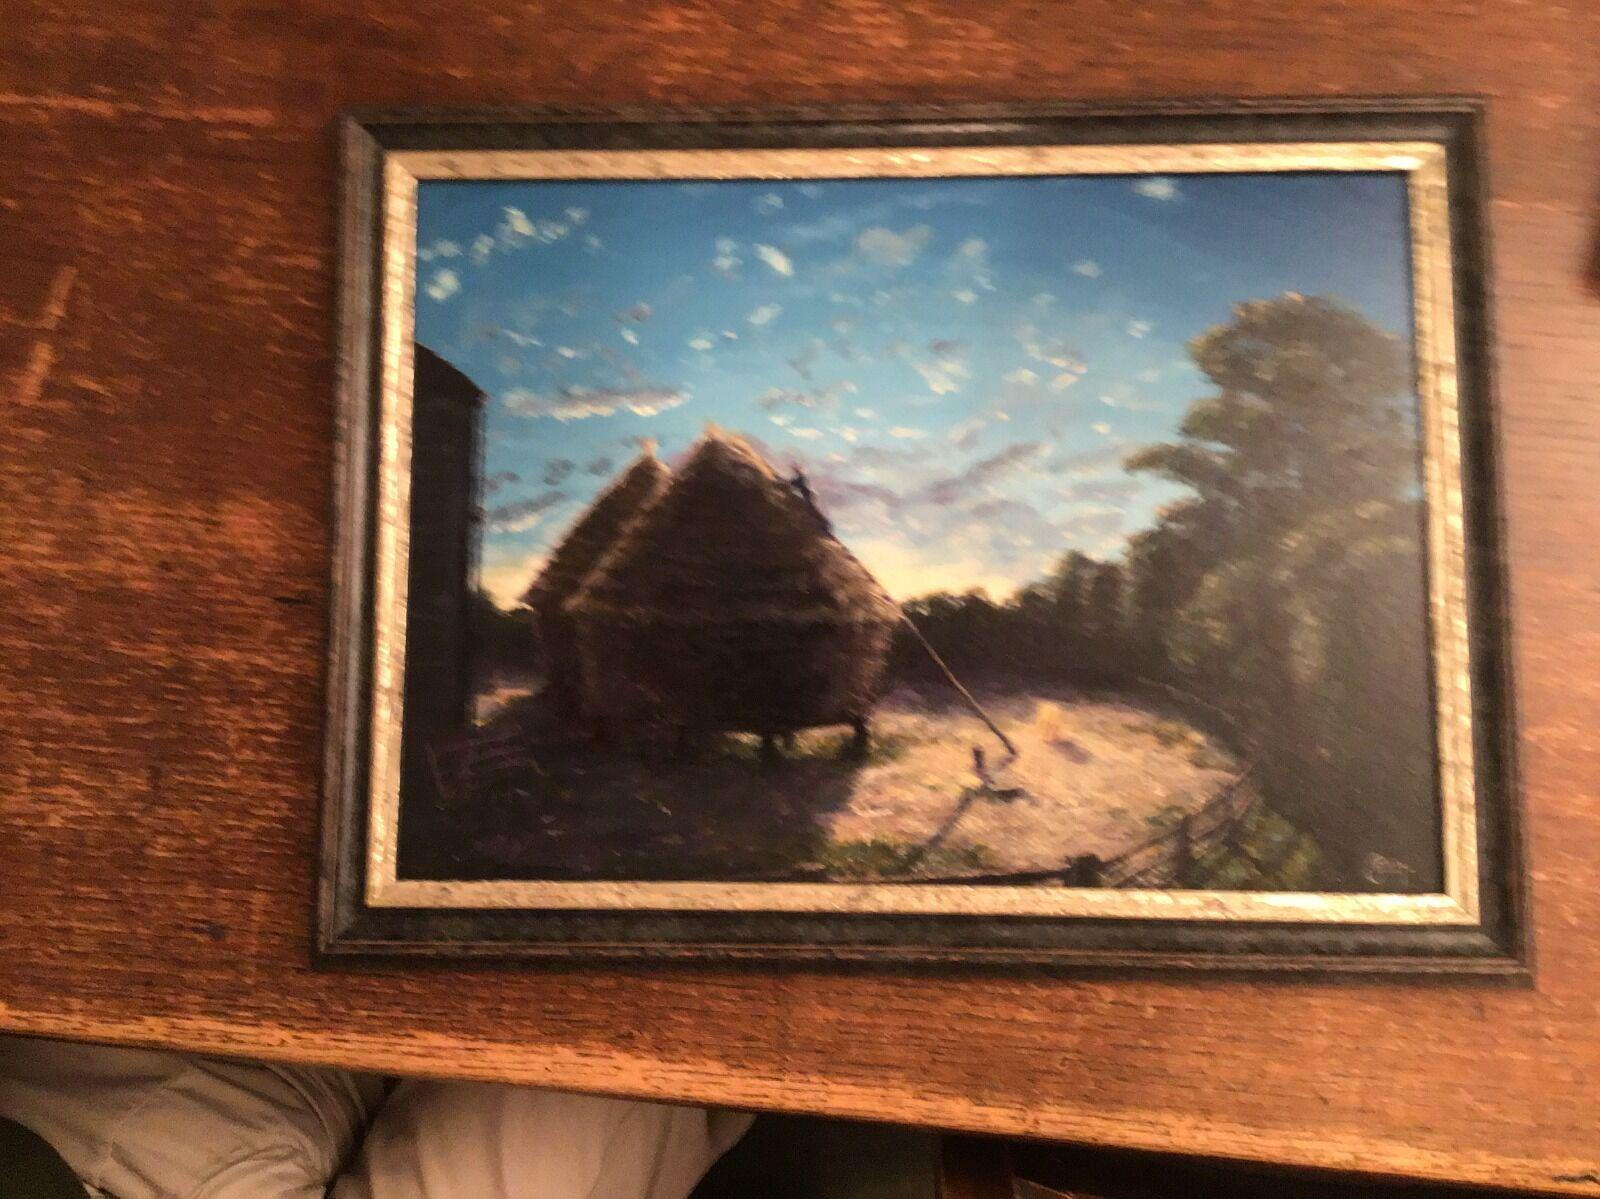 rick thatching at dusk framed